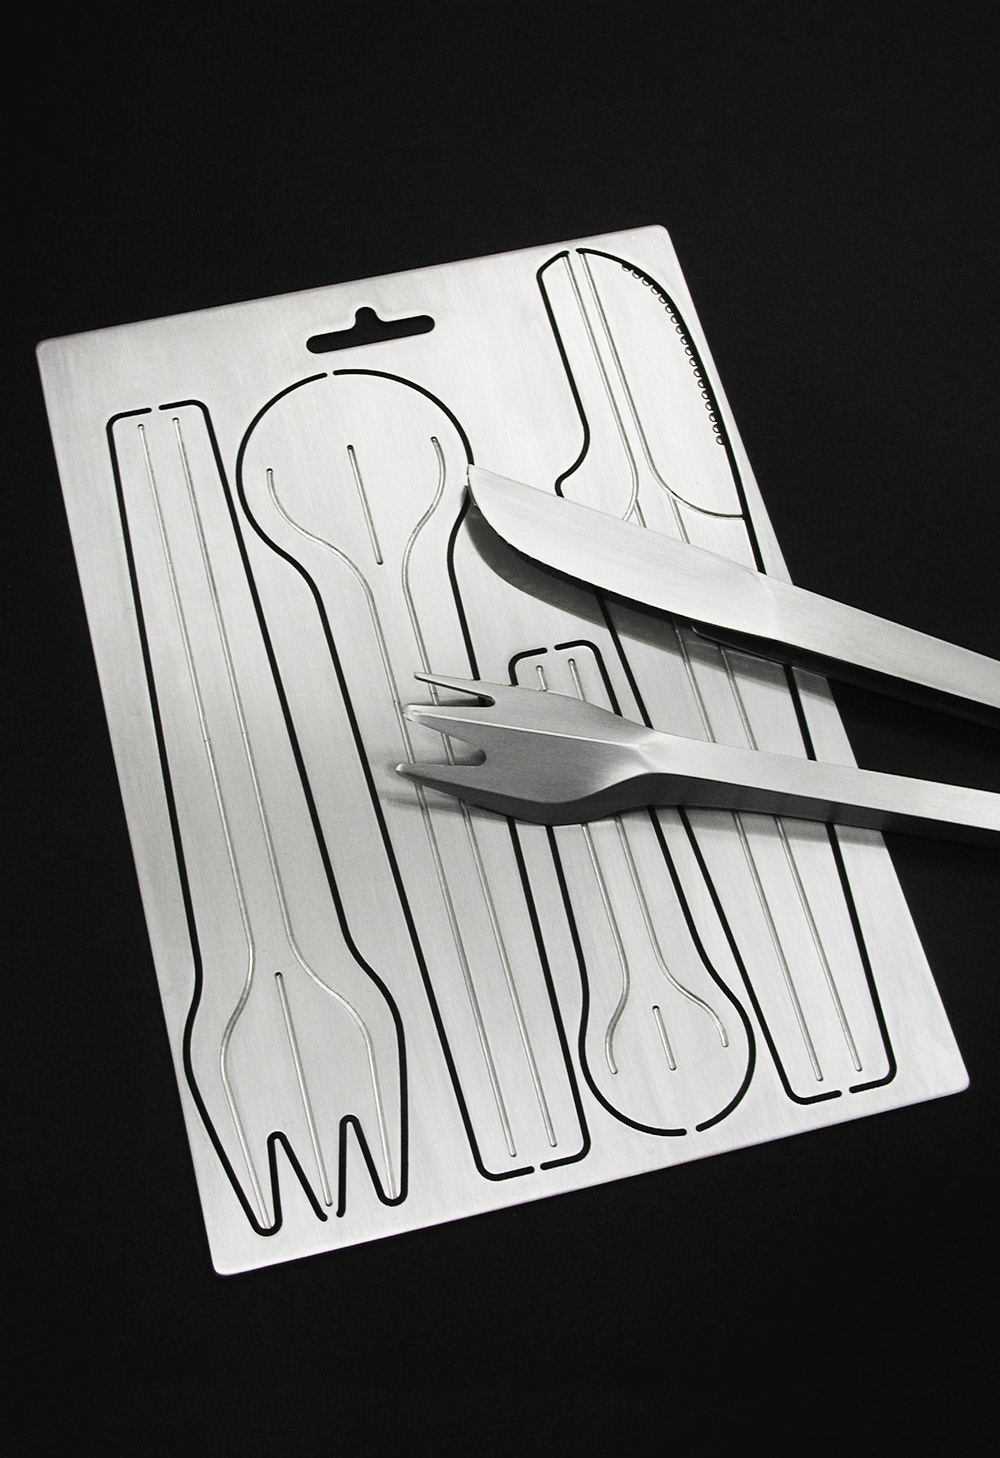 Do! cutlery by Arihiro Miyake